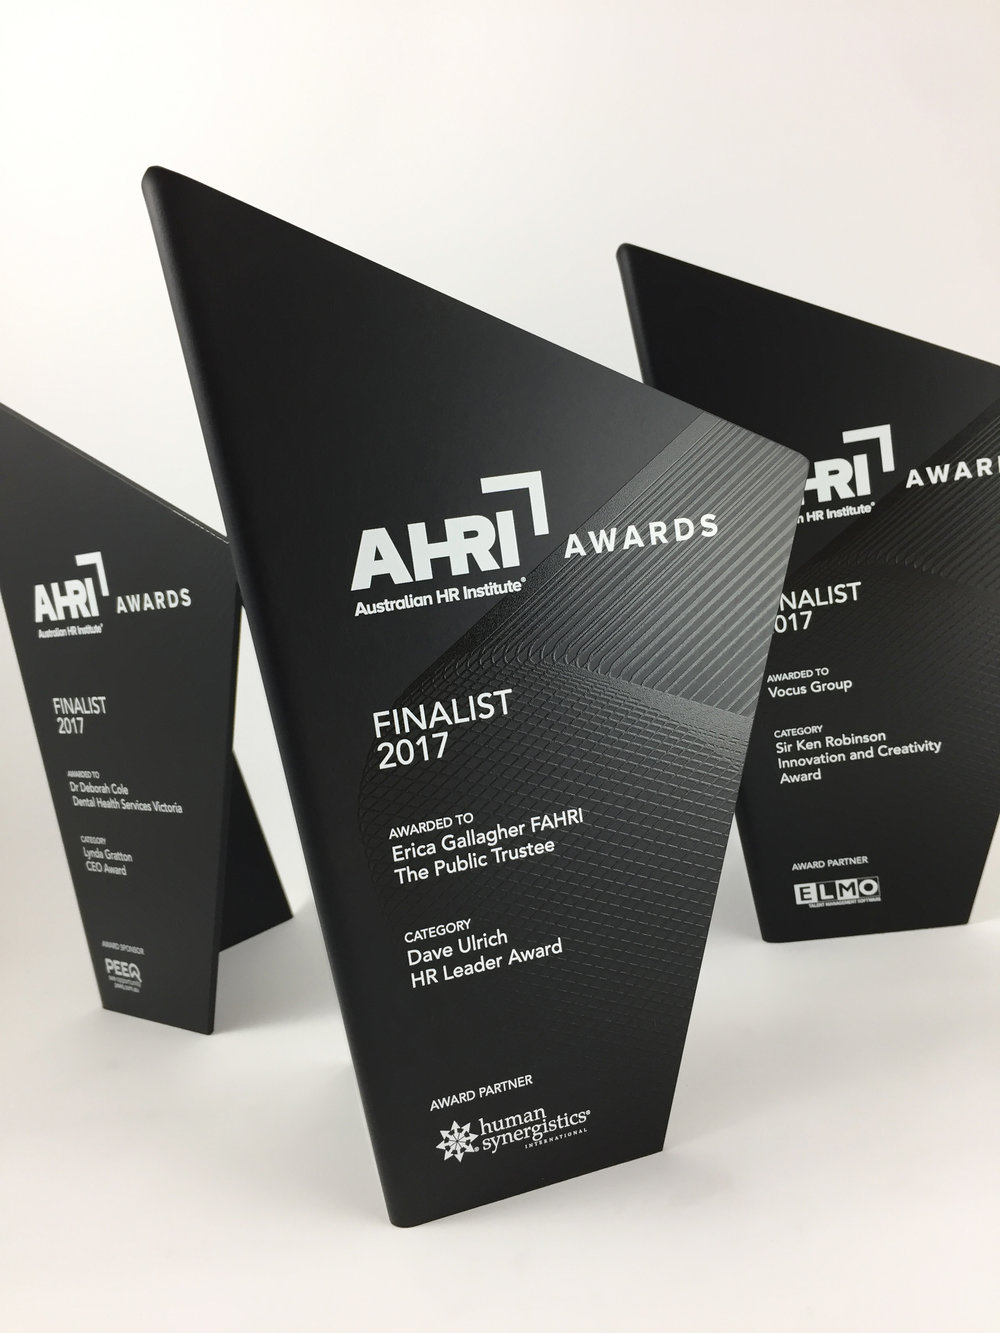 AHRI-aluminium-graphic-trophy-award-05.jpg